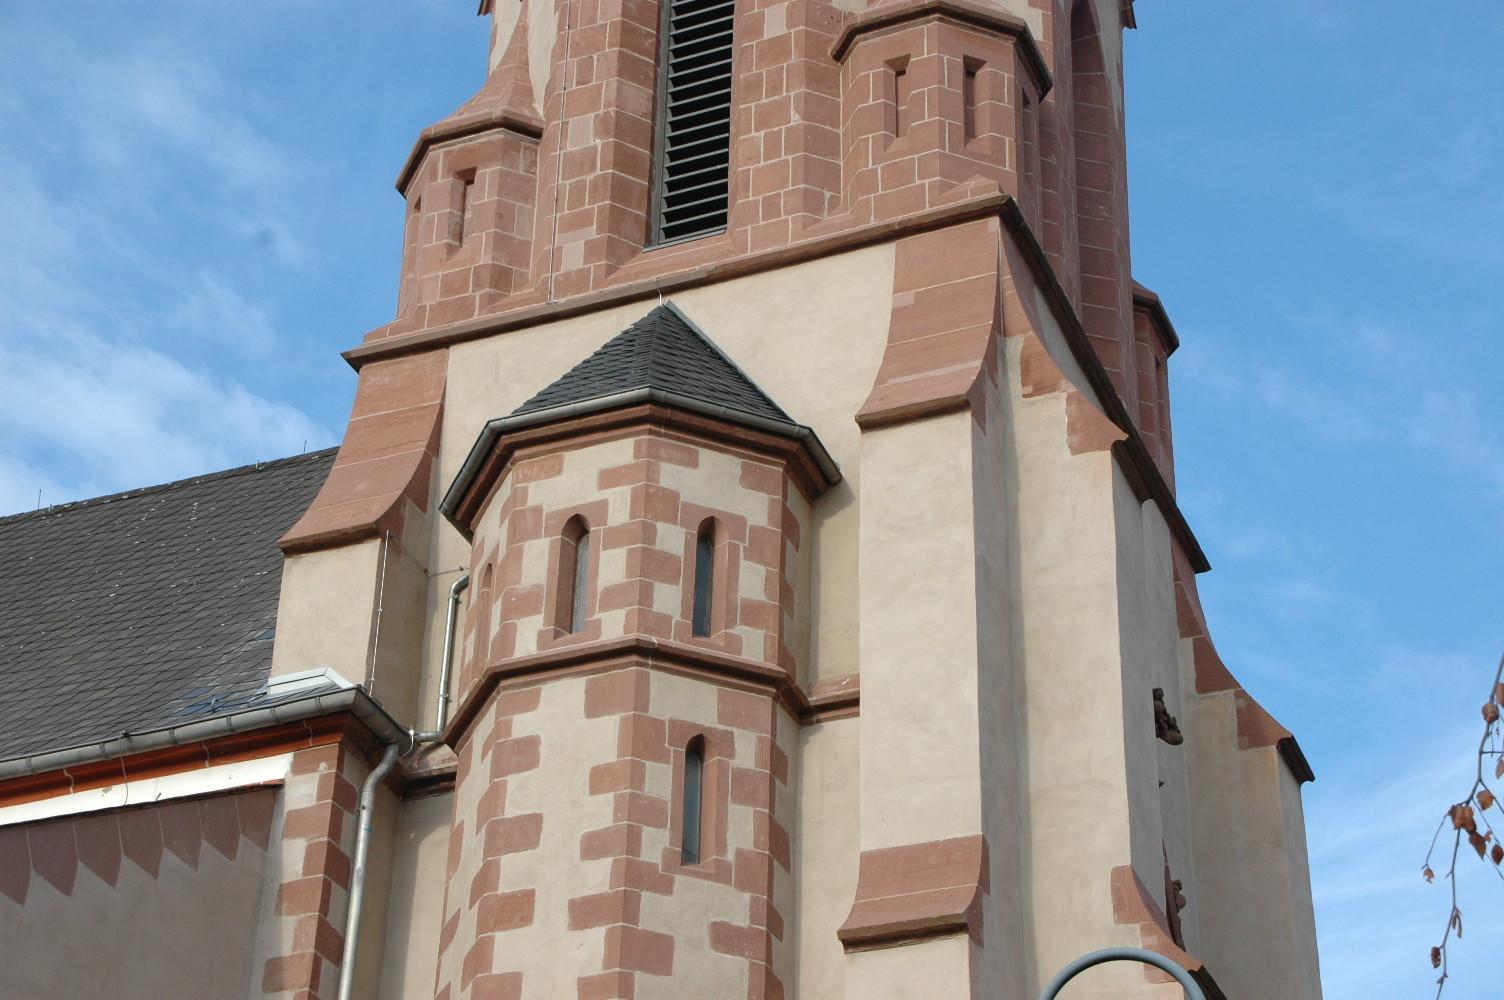 Kath. Kirche, Bengel